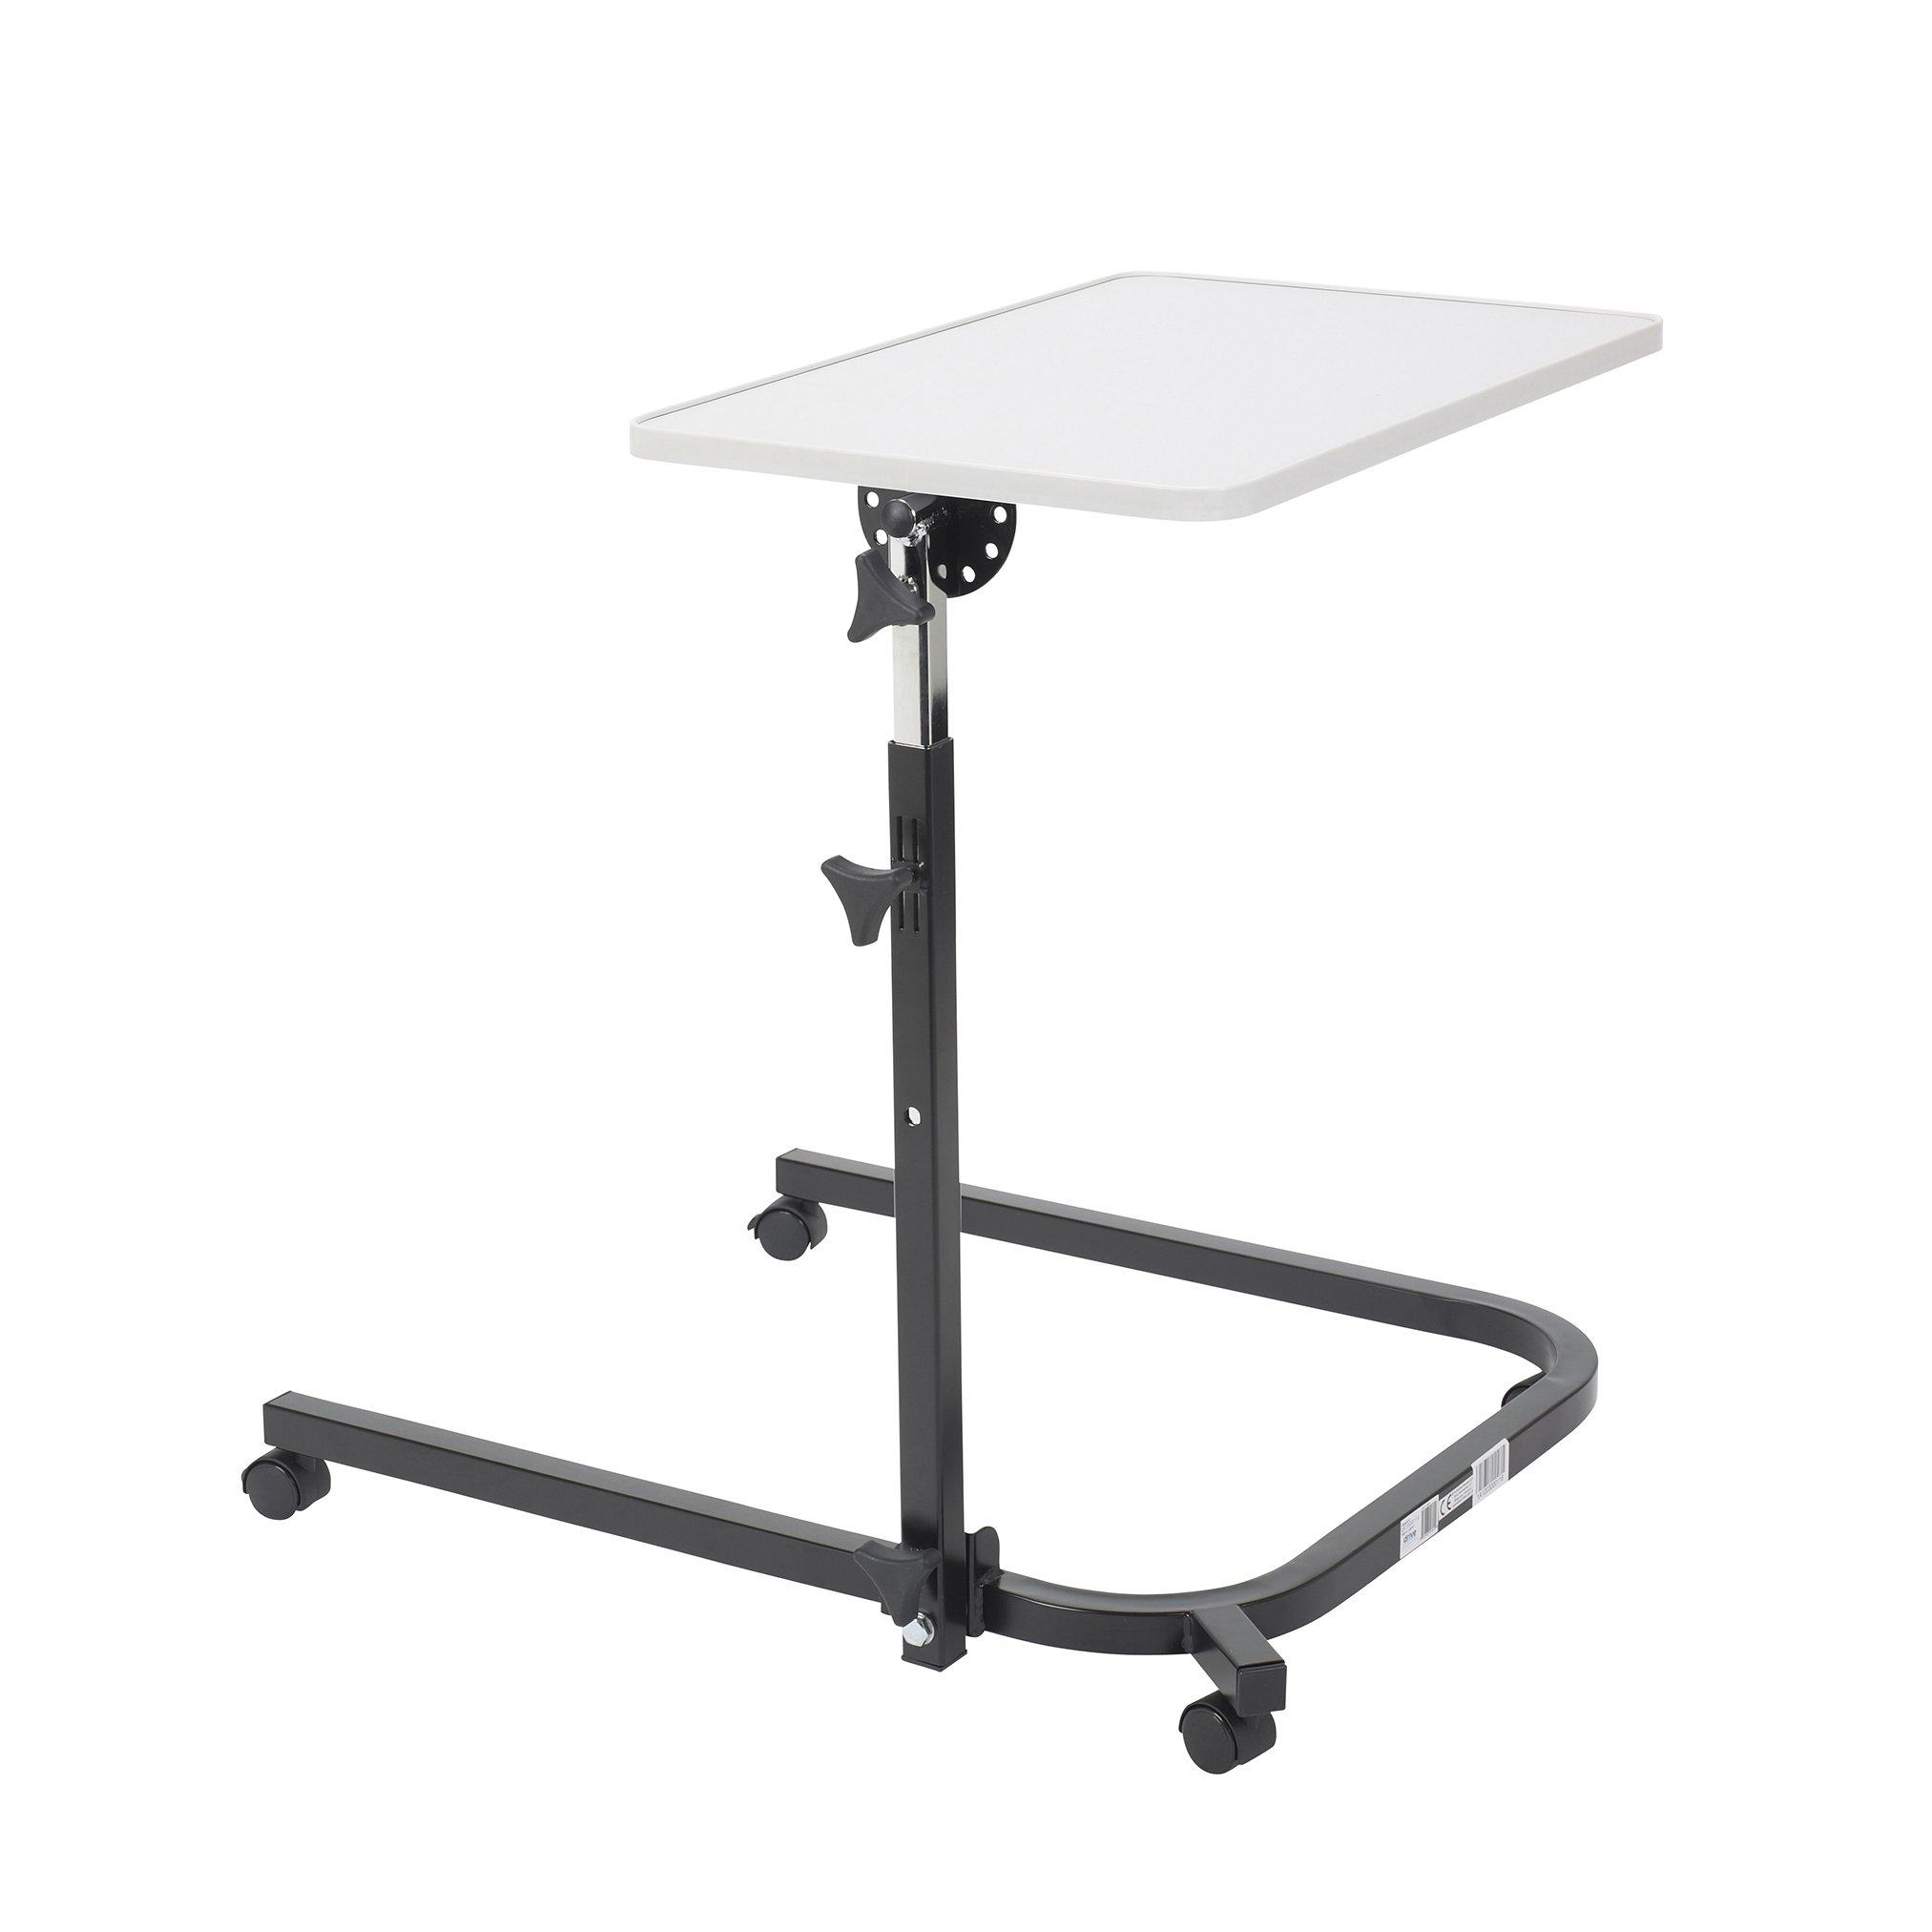 Drive Medical Pivot and Tilt Adjustable Overbed Table